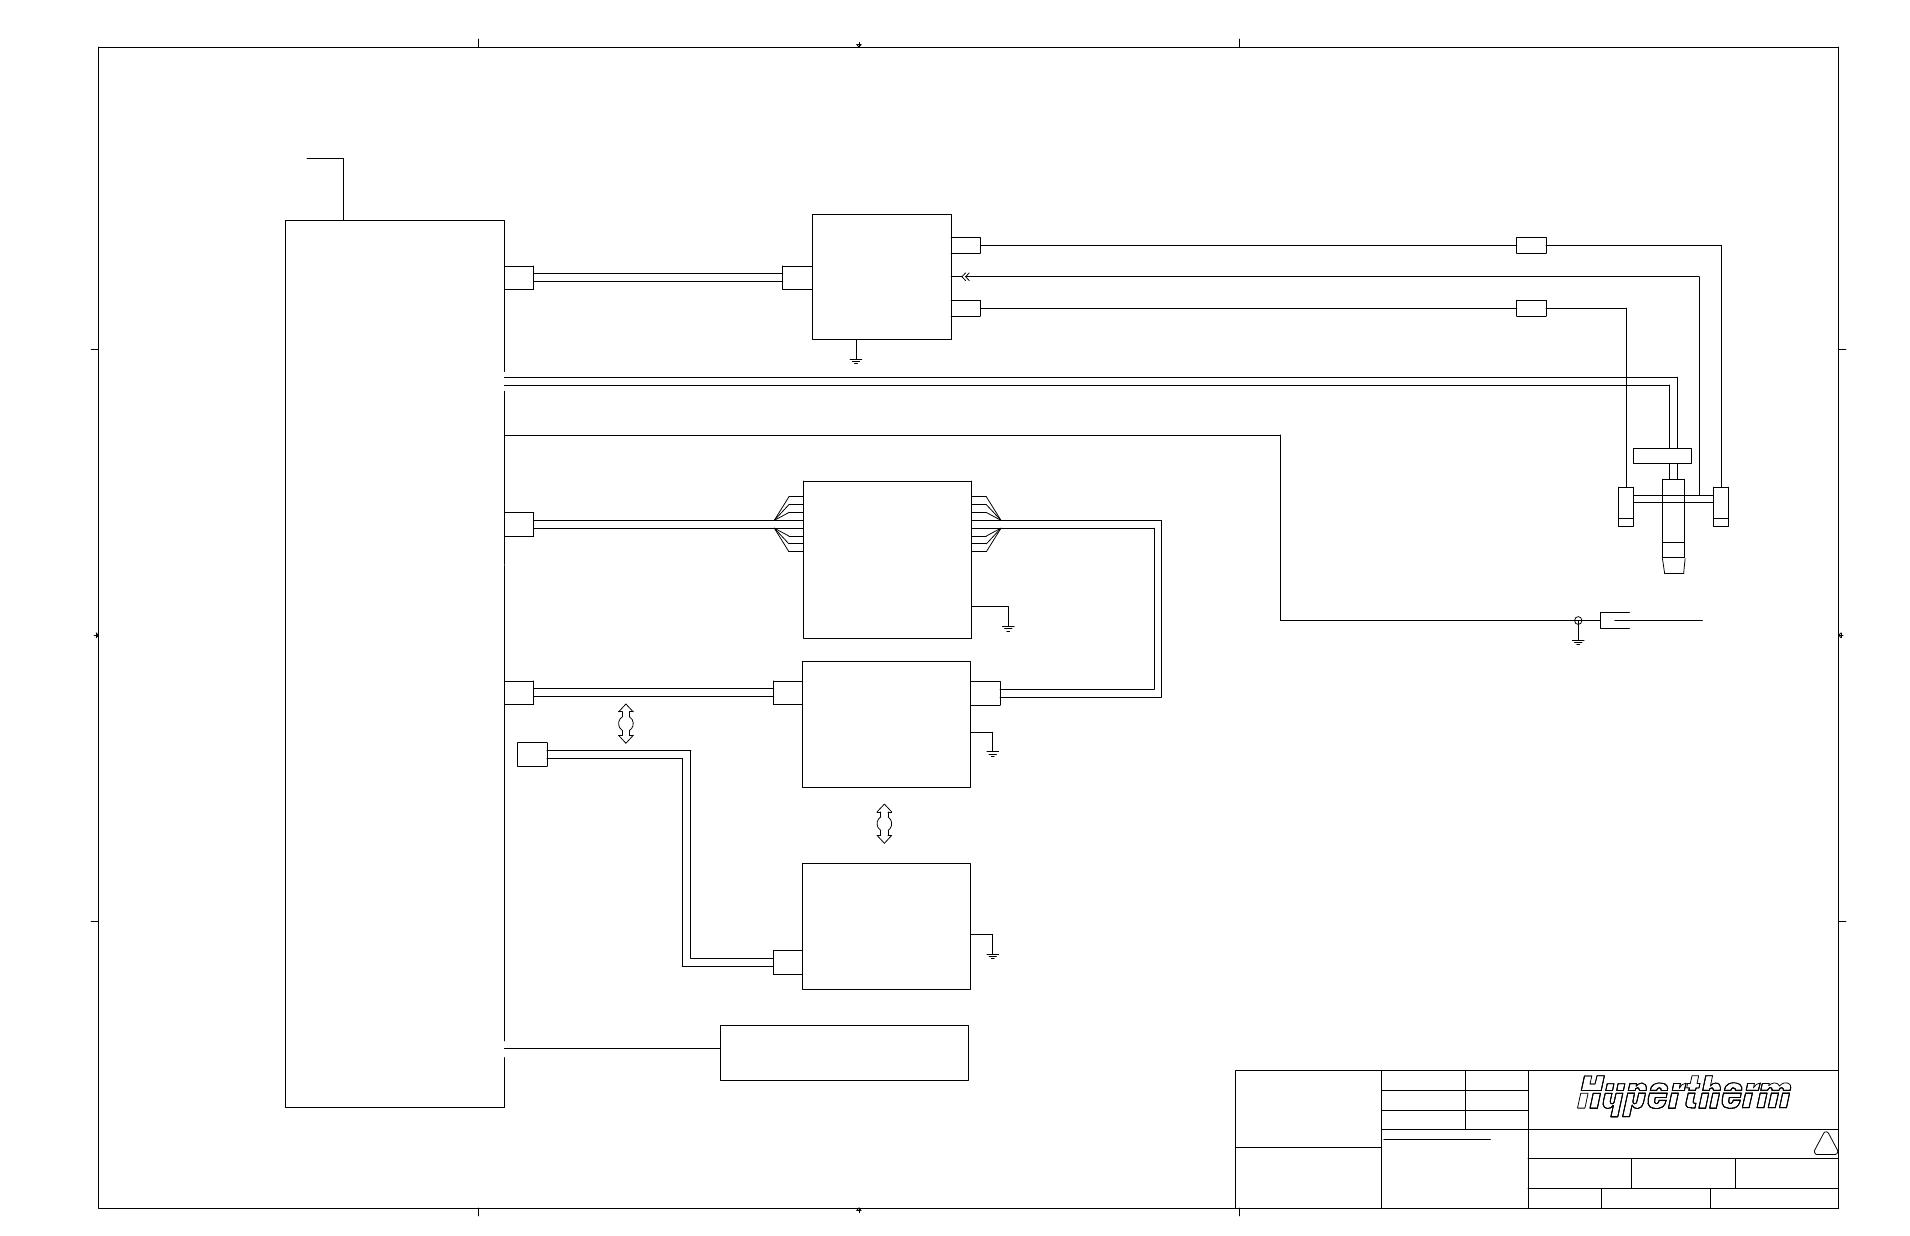 Max200 Wiring Diagrams  Elec  Gas Schem  Max200  Interface